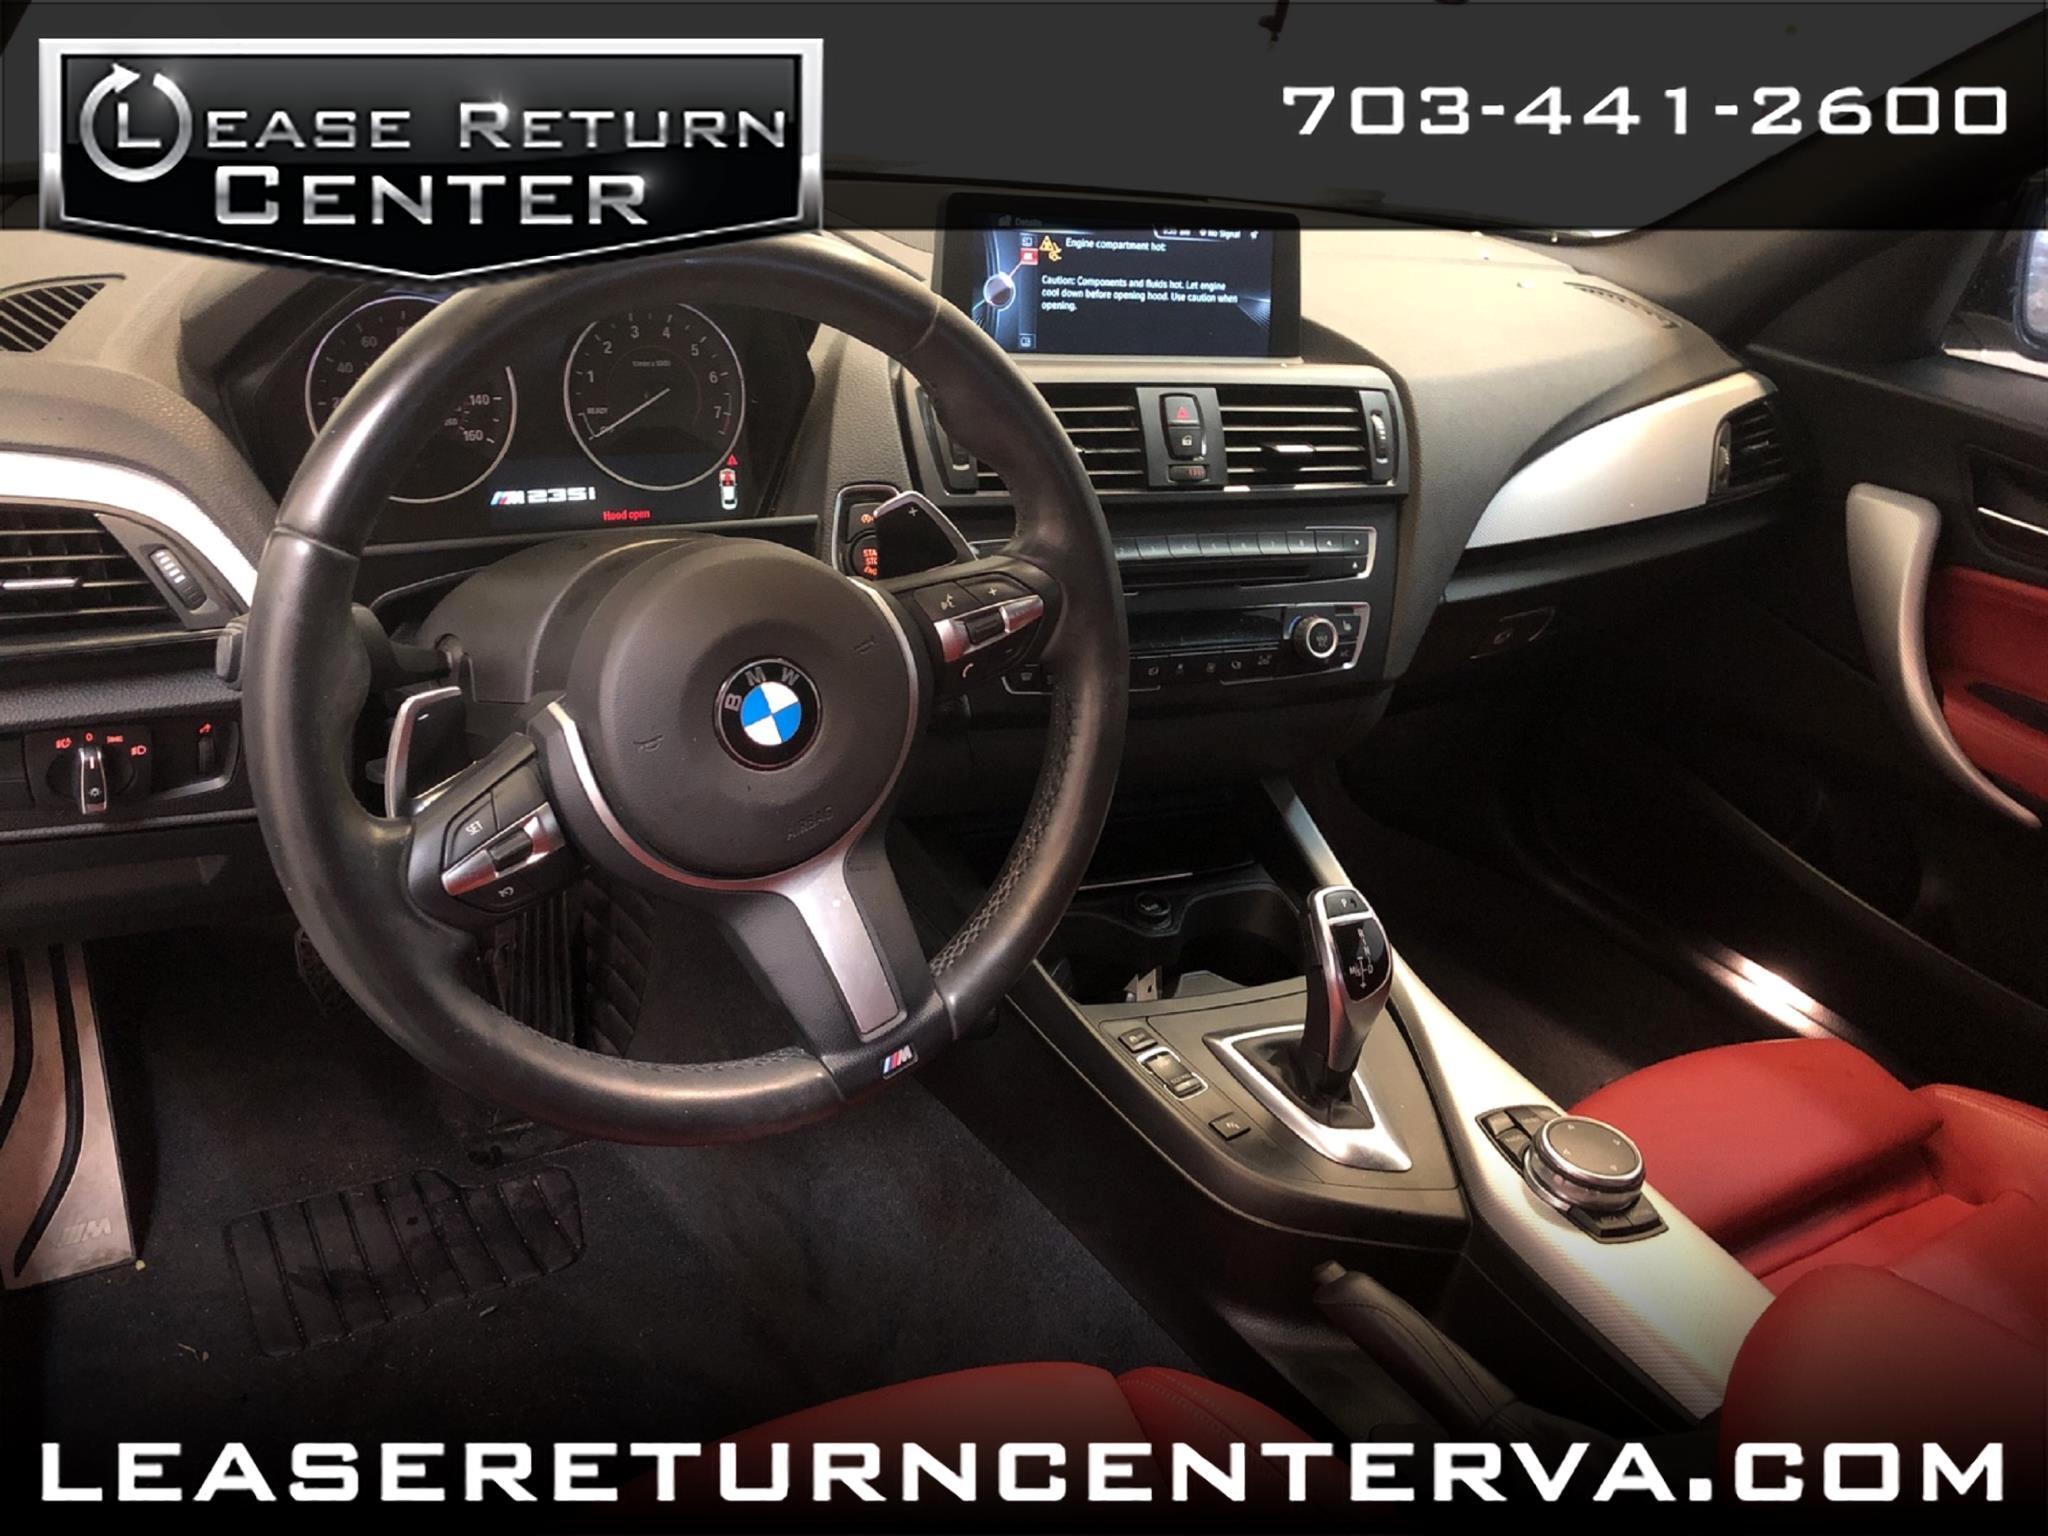 2015 BMW 2 Series 2dr Cpe M235i RWD